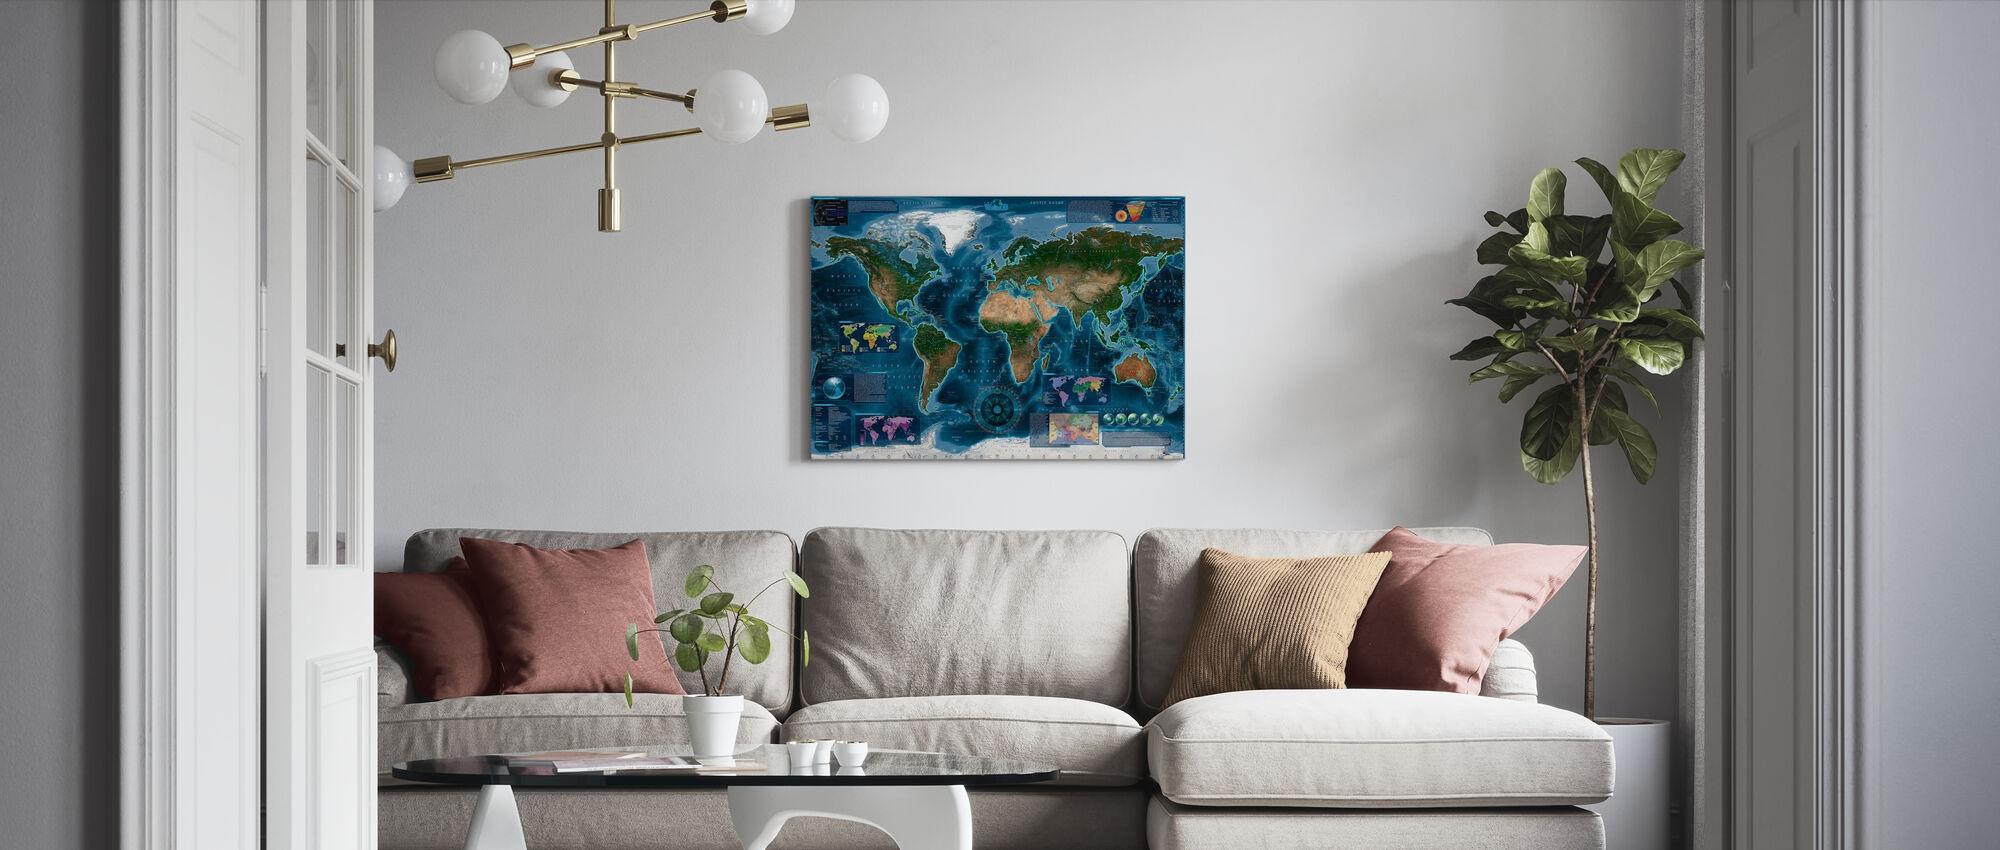 Satelite Kaart Infographic - Canvas print - Woonkamer